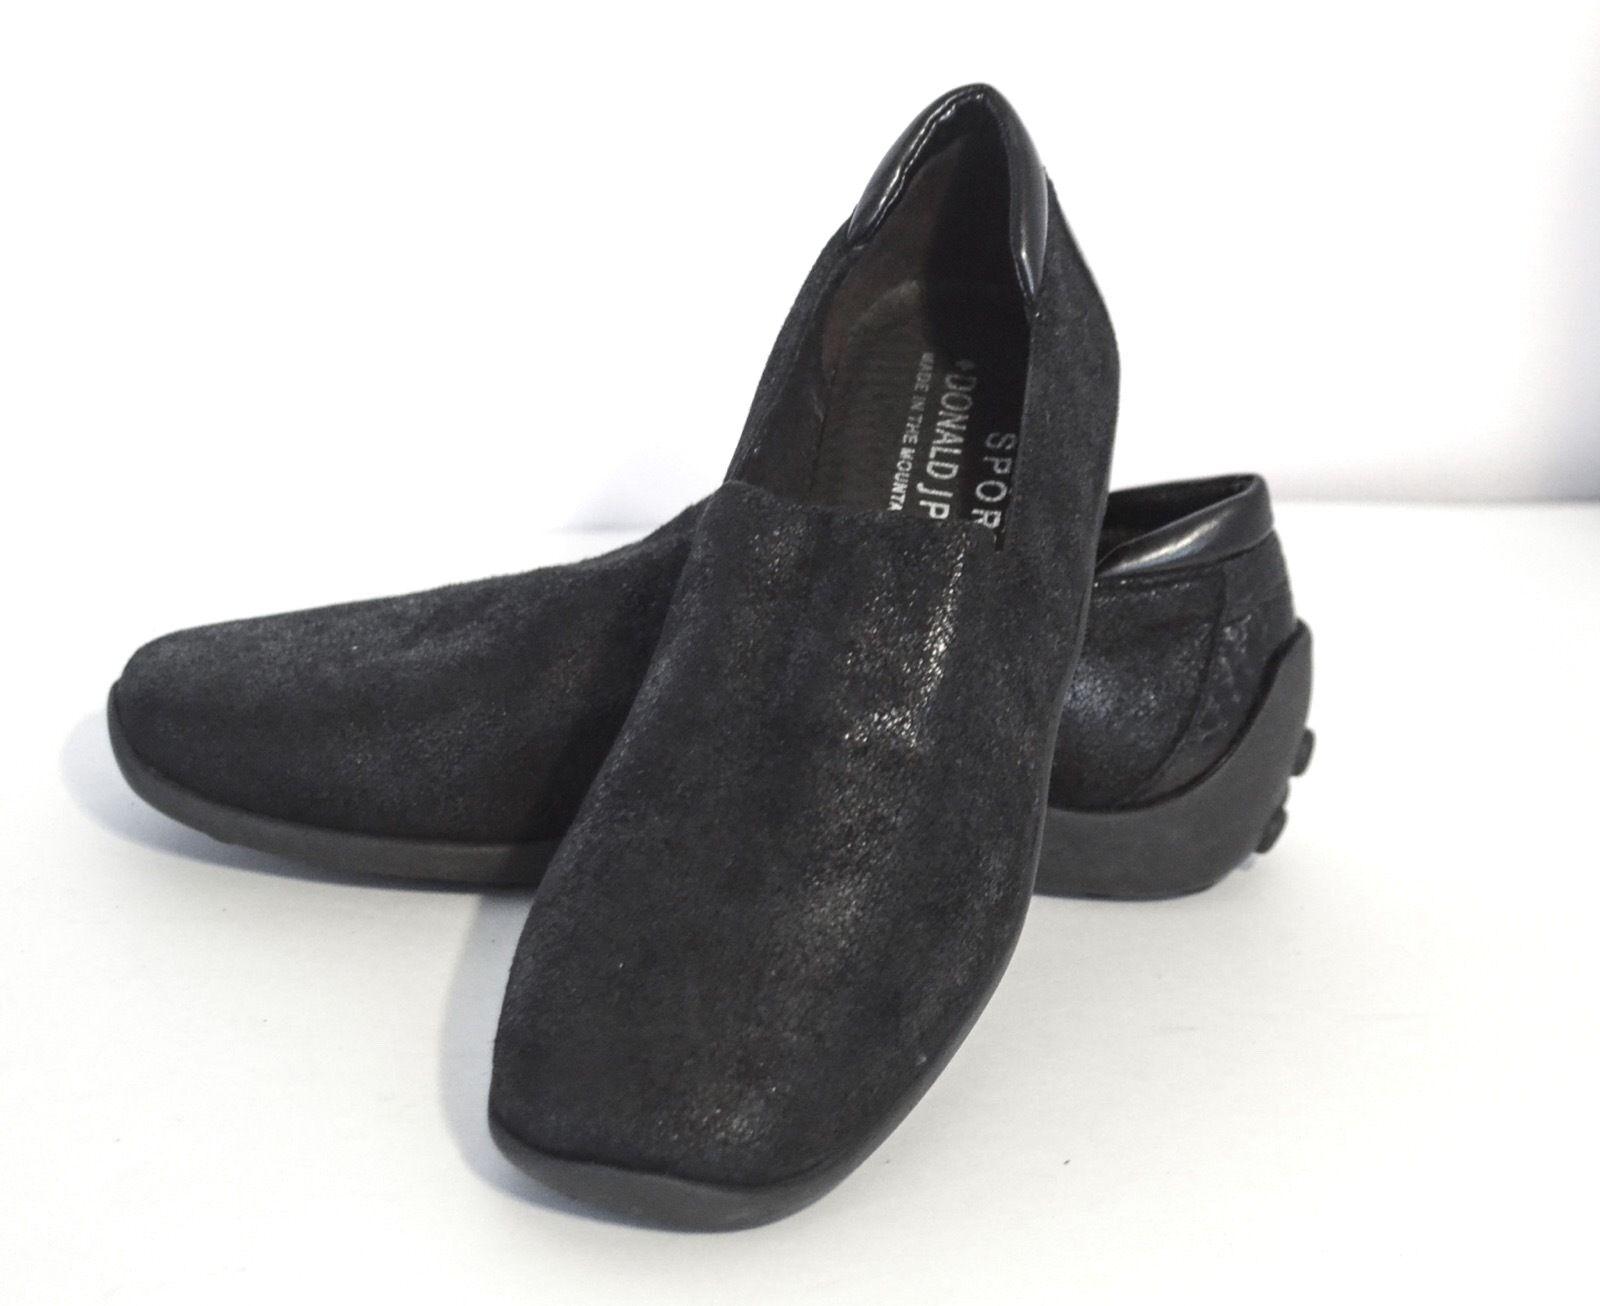 Donald J. Pliner Sport NAVA NAVA NAVA Women's Black Shimmering Leather Driving shoes 7M 067113